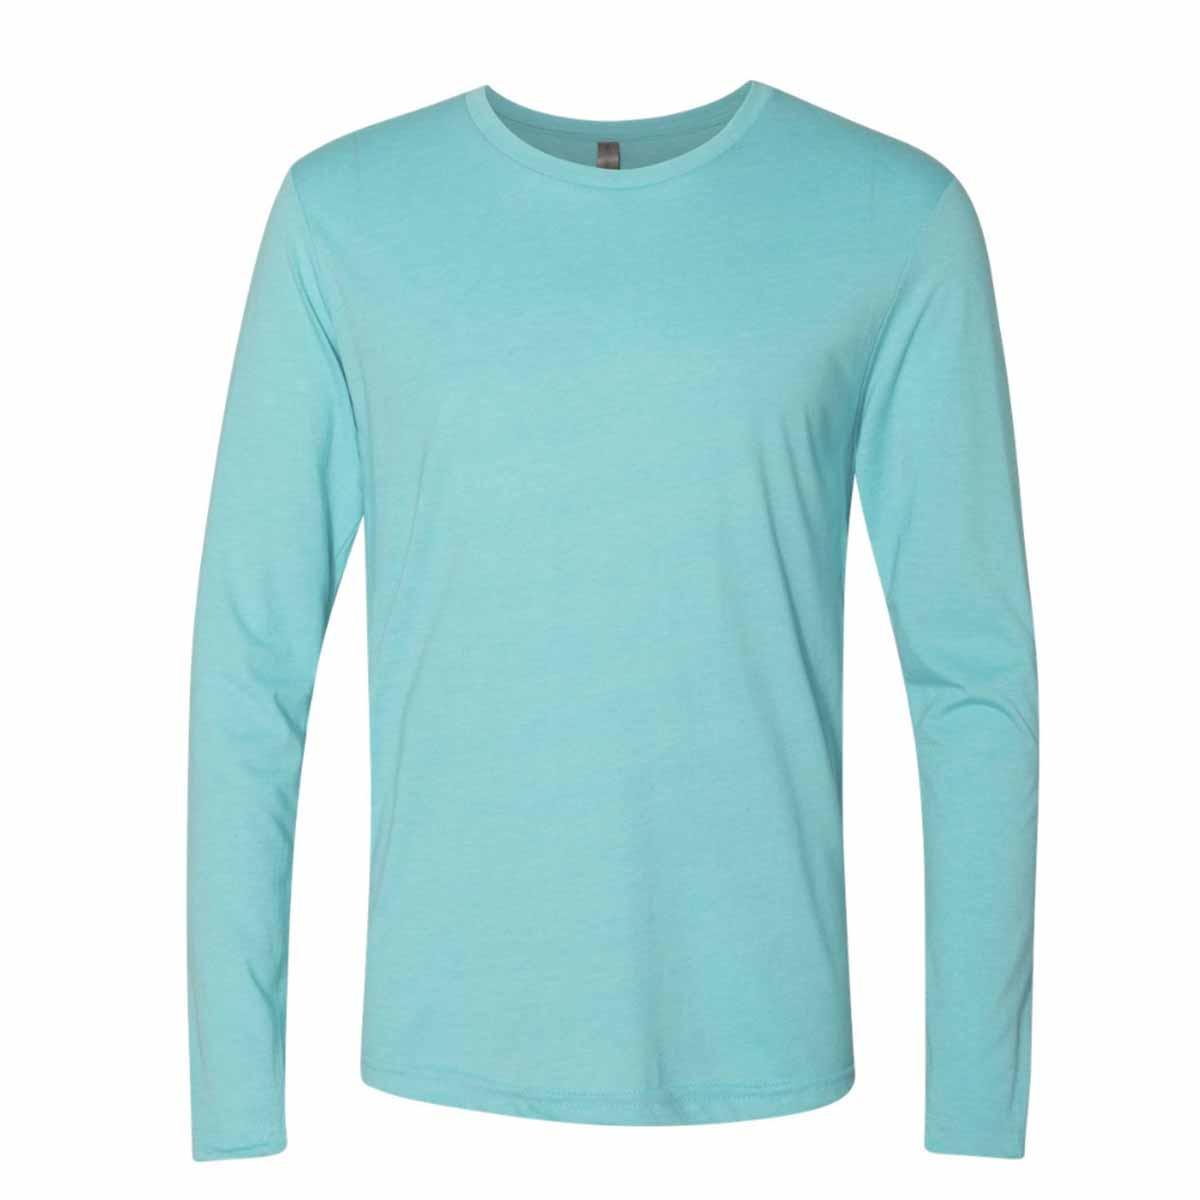 Ssactivewear nextlevellongsleeveshirt turquoise